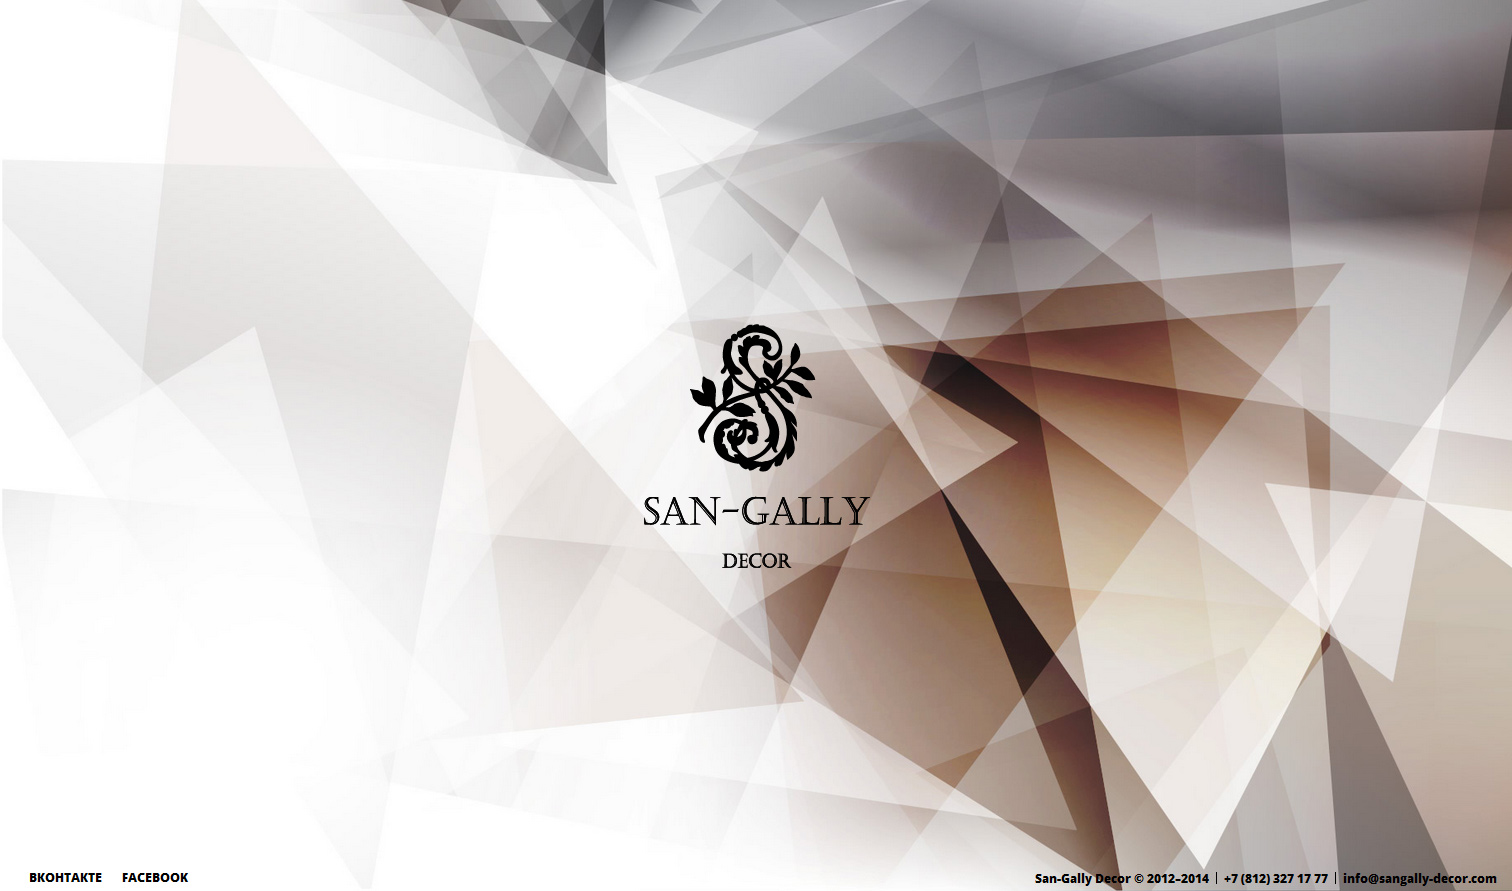 Sun Gally Decor